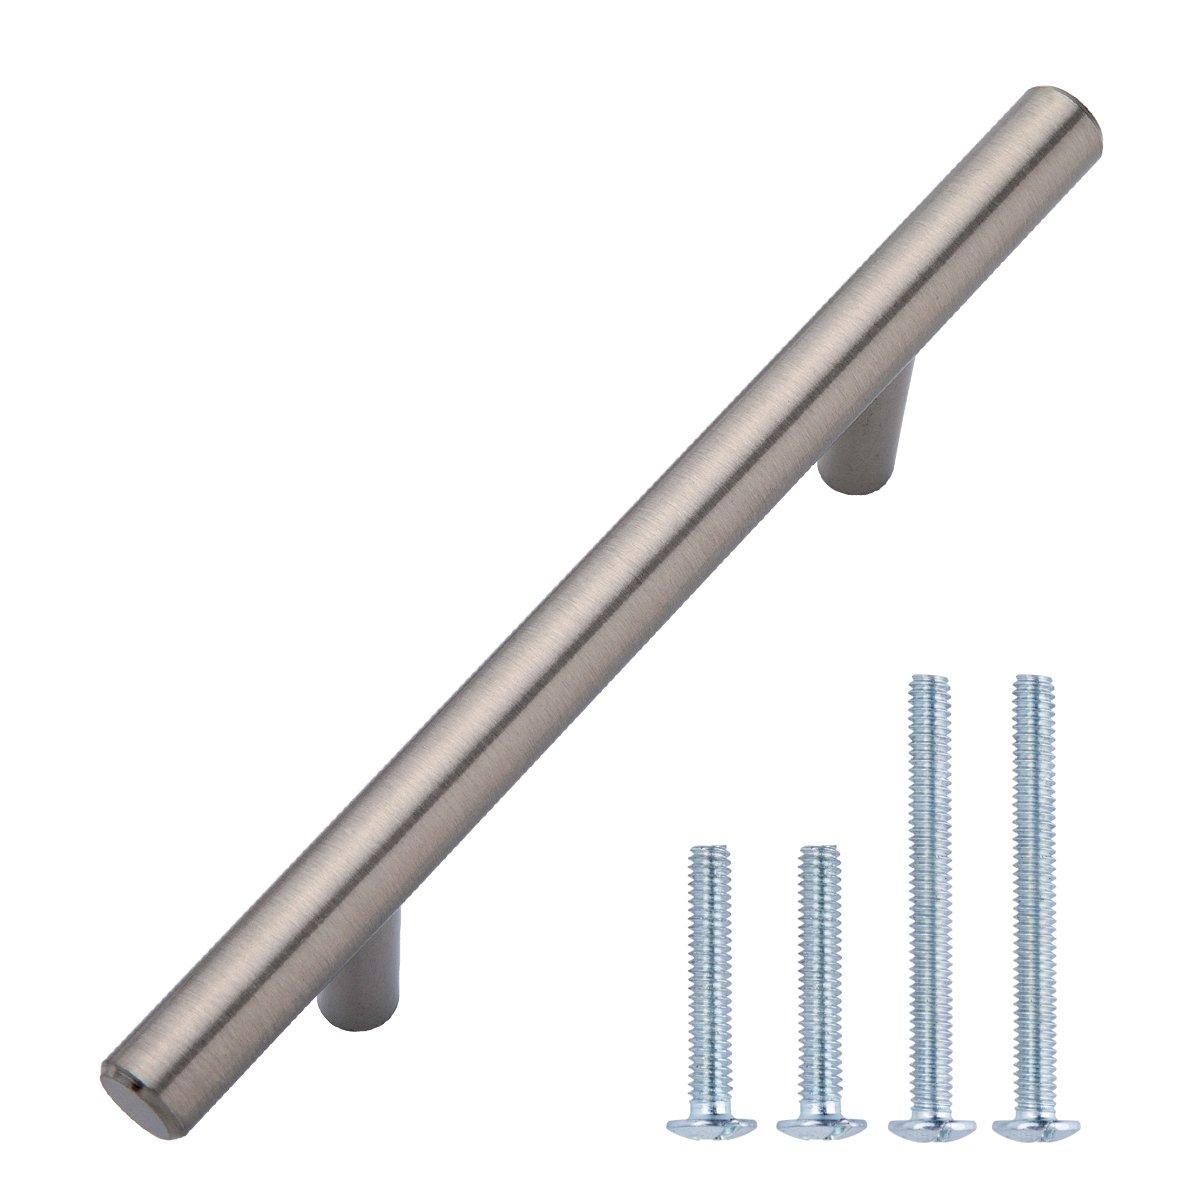 "AmazonBasics Euro Bar Cabinet Handle (3/8"" Diameter), 5.38"" Length (3"" Hole Center), Satin Nickel, 10-Pack"